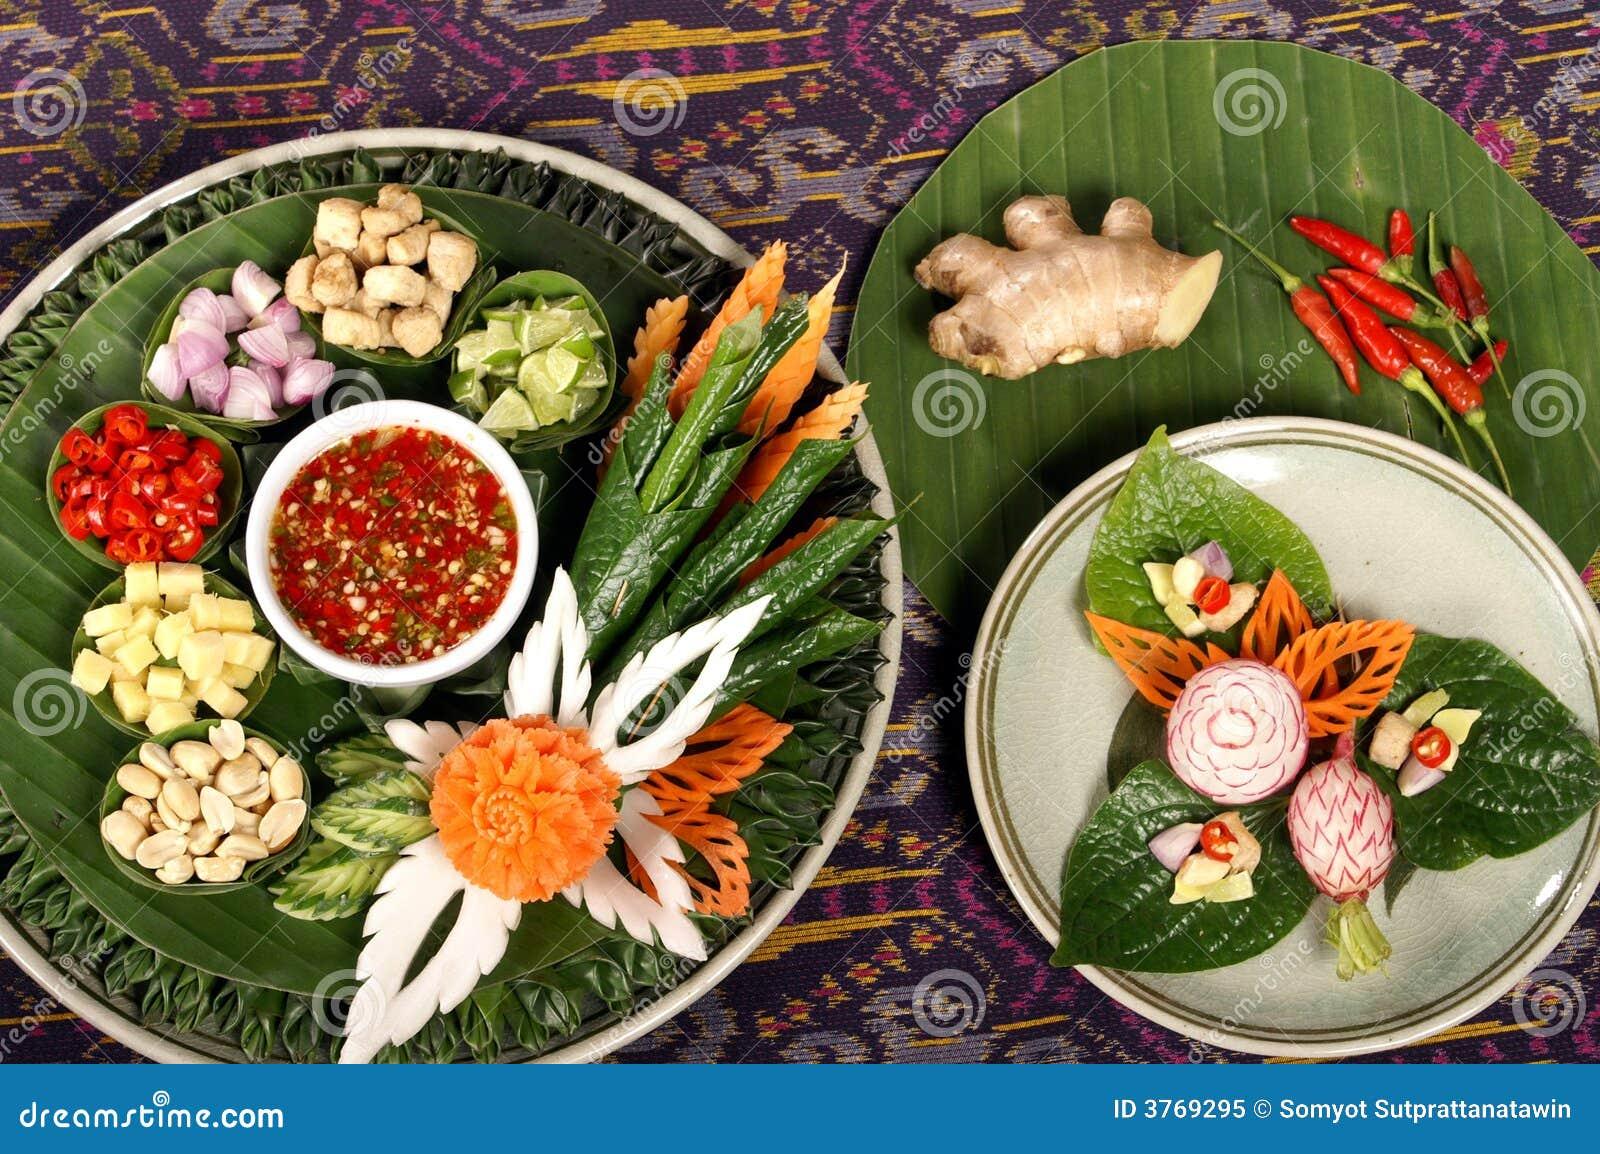 Thai herb ingredient